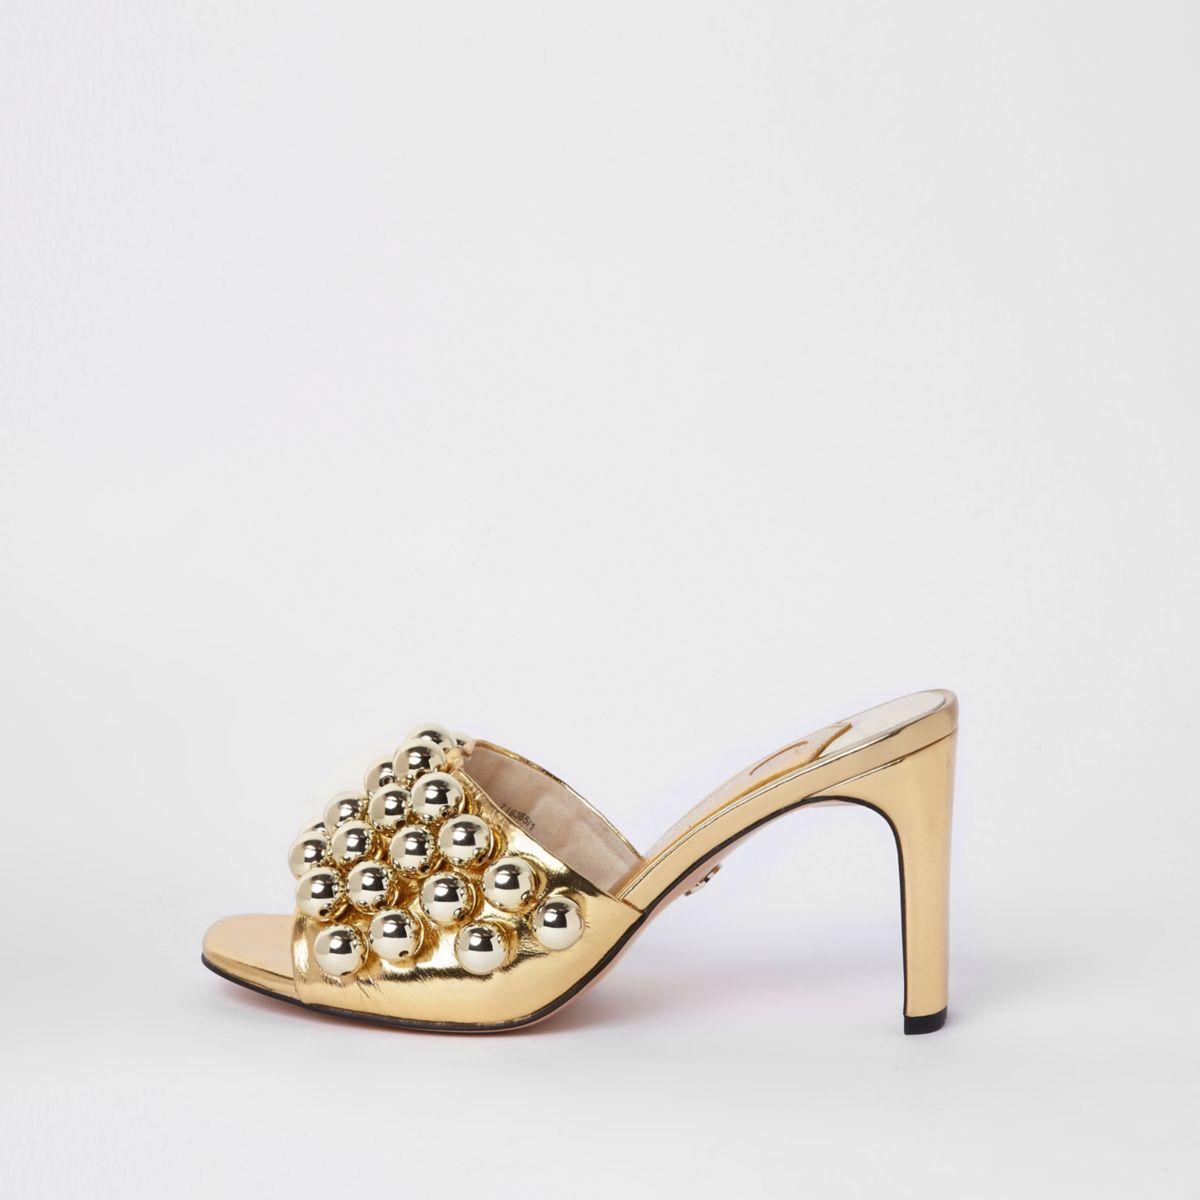 Goudkleurige sandalen met hak en kralenborduursel